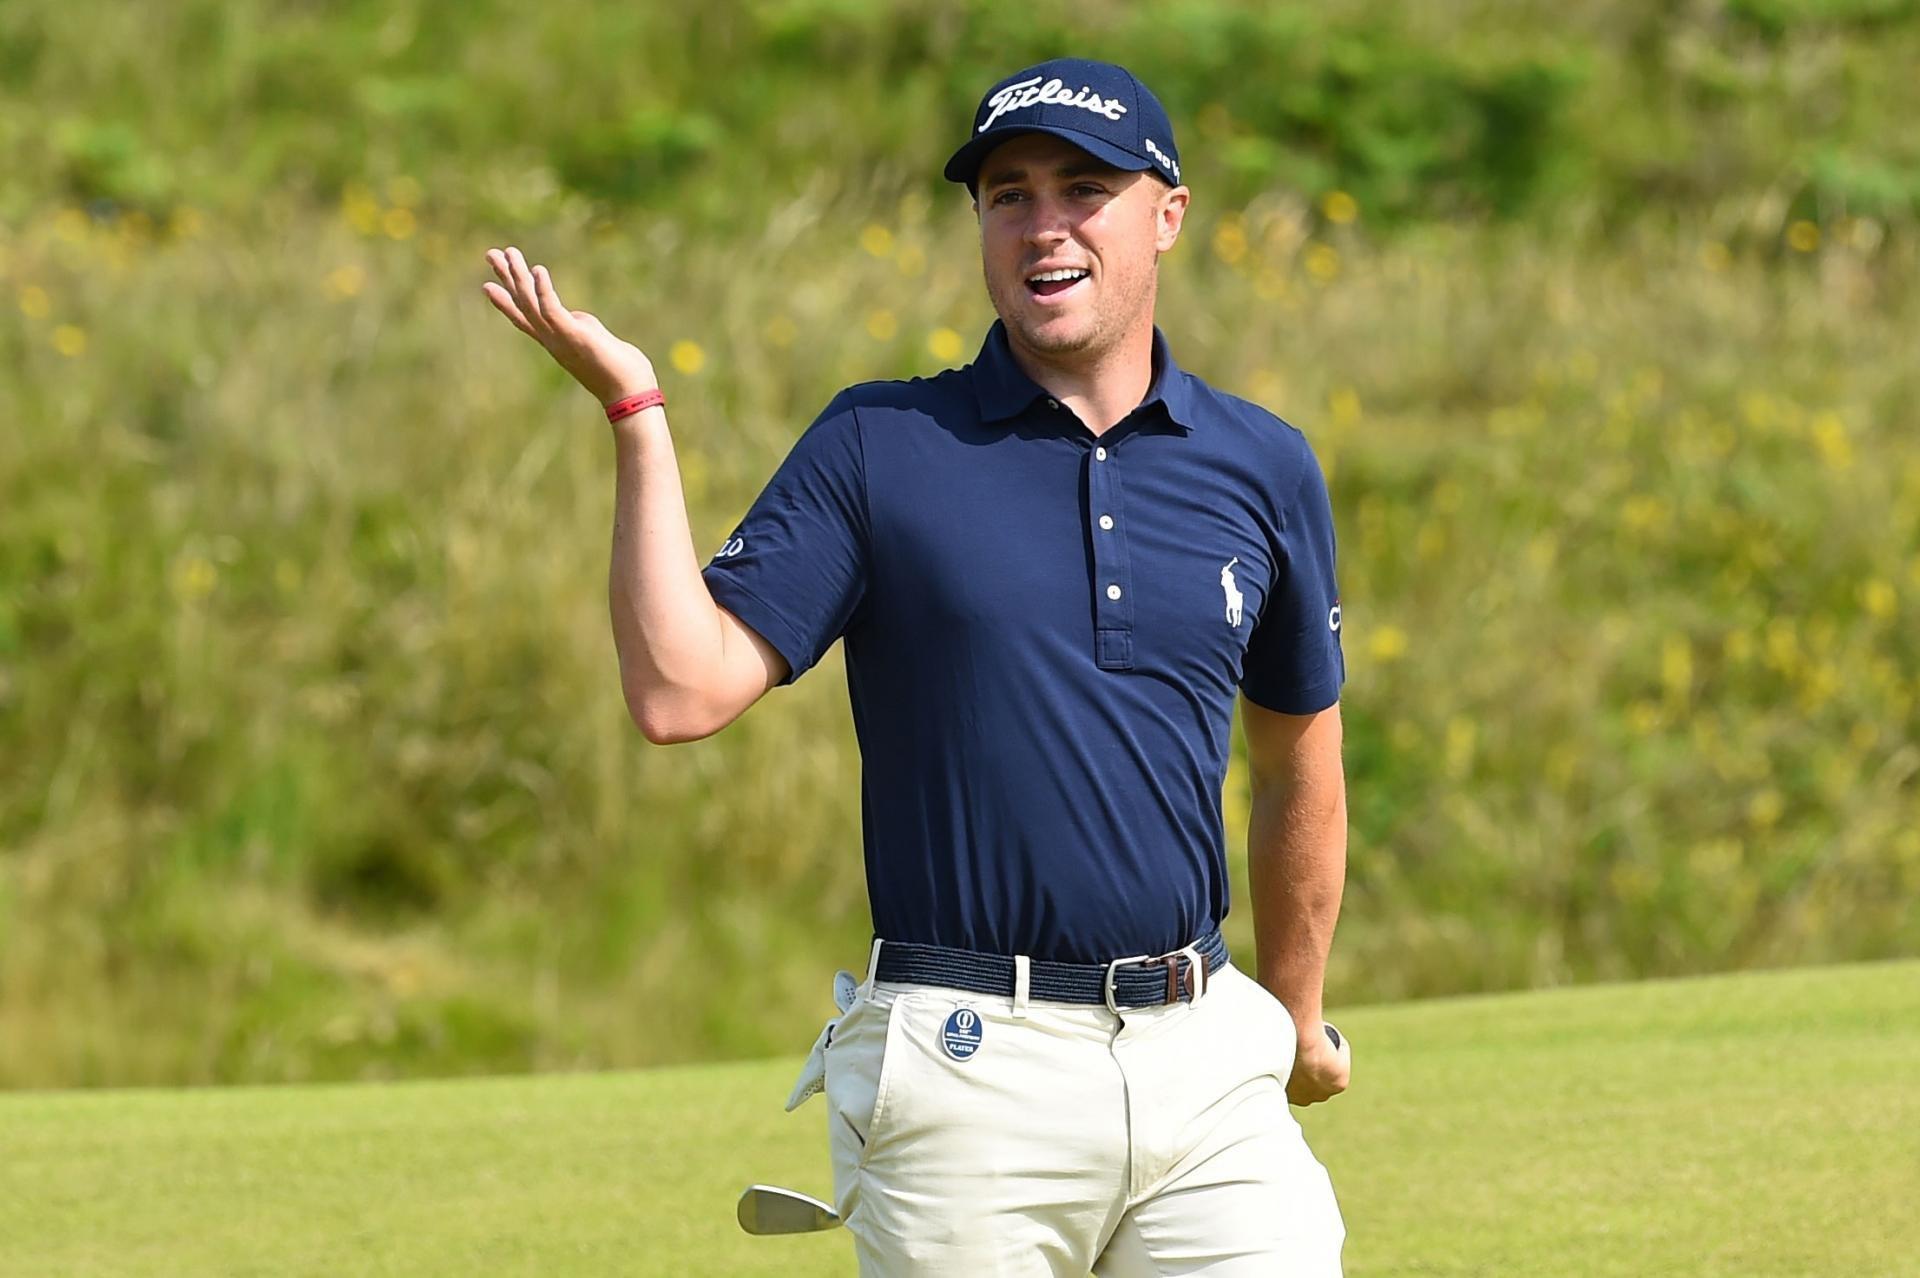 Justin Thomas breaks golf's unspoken rule of decorum